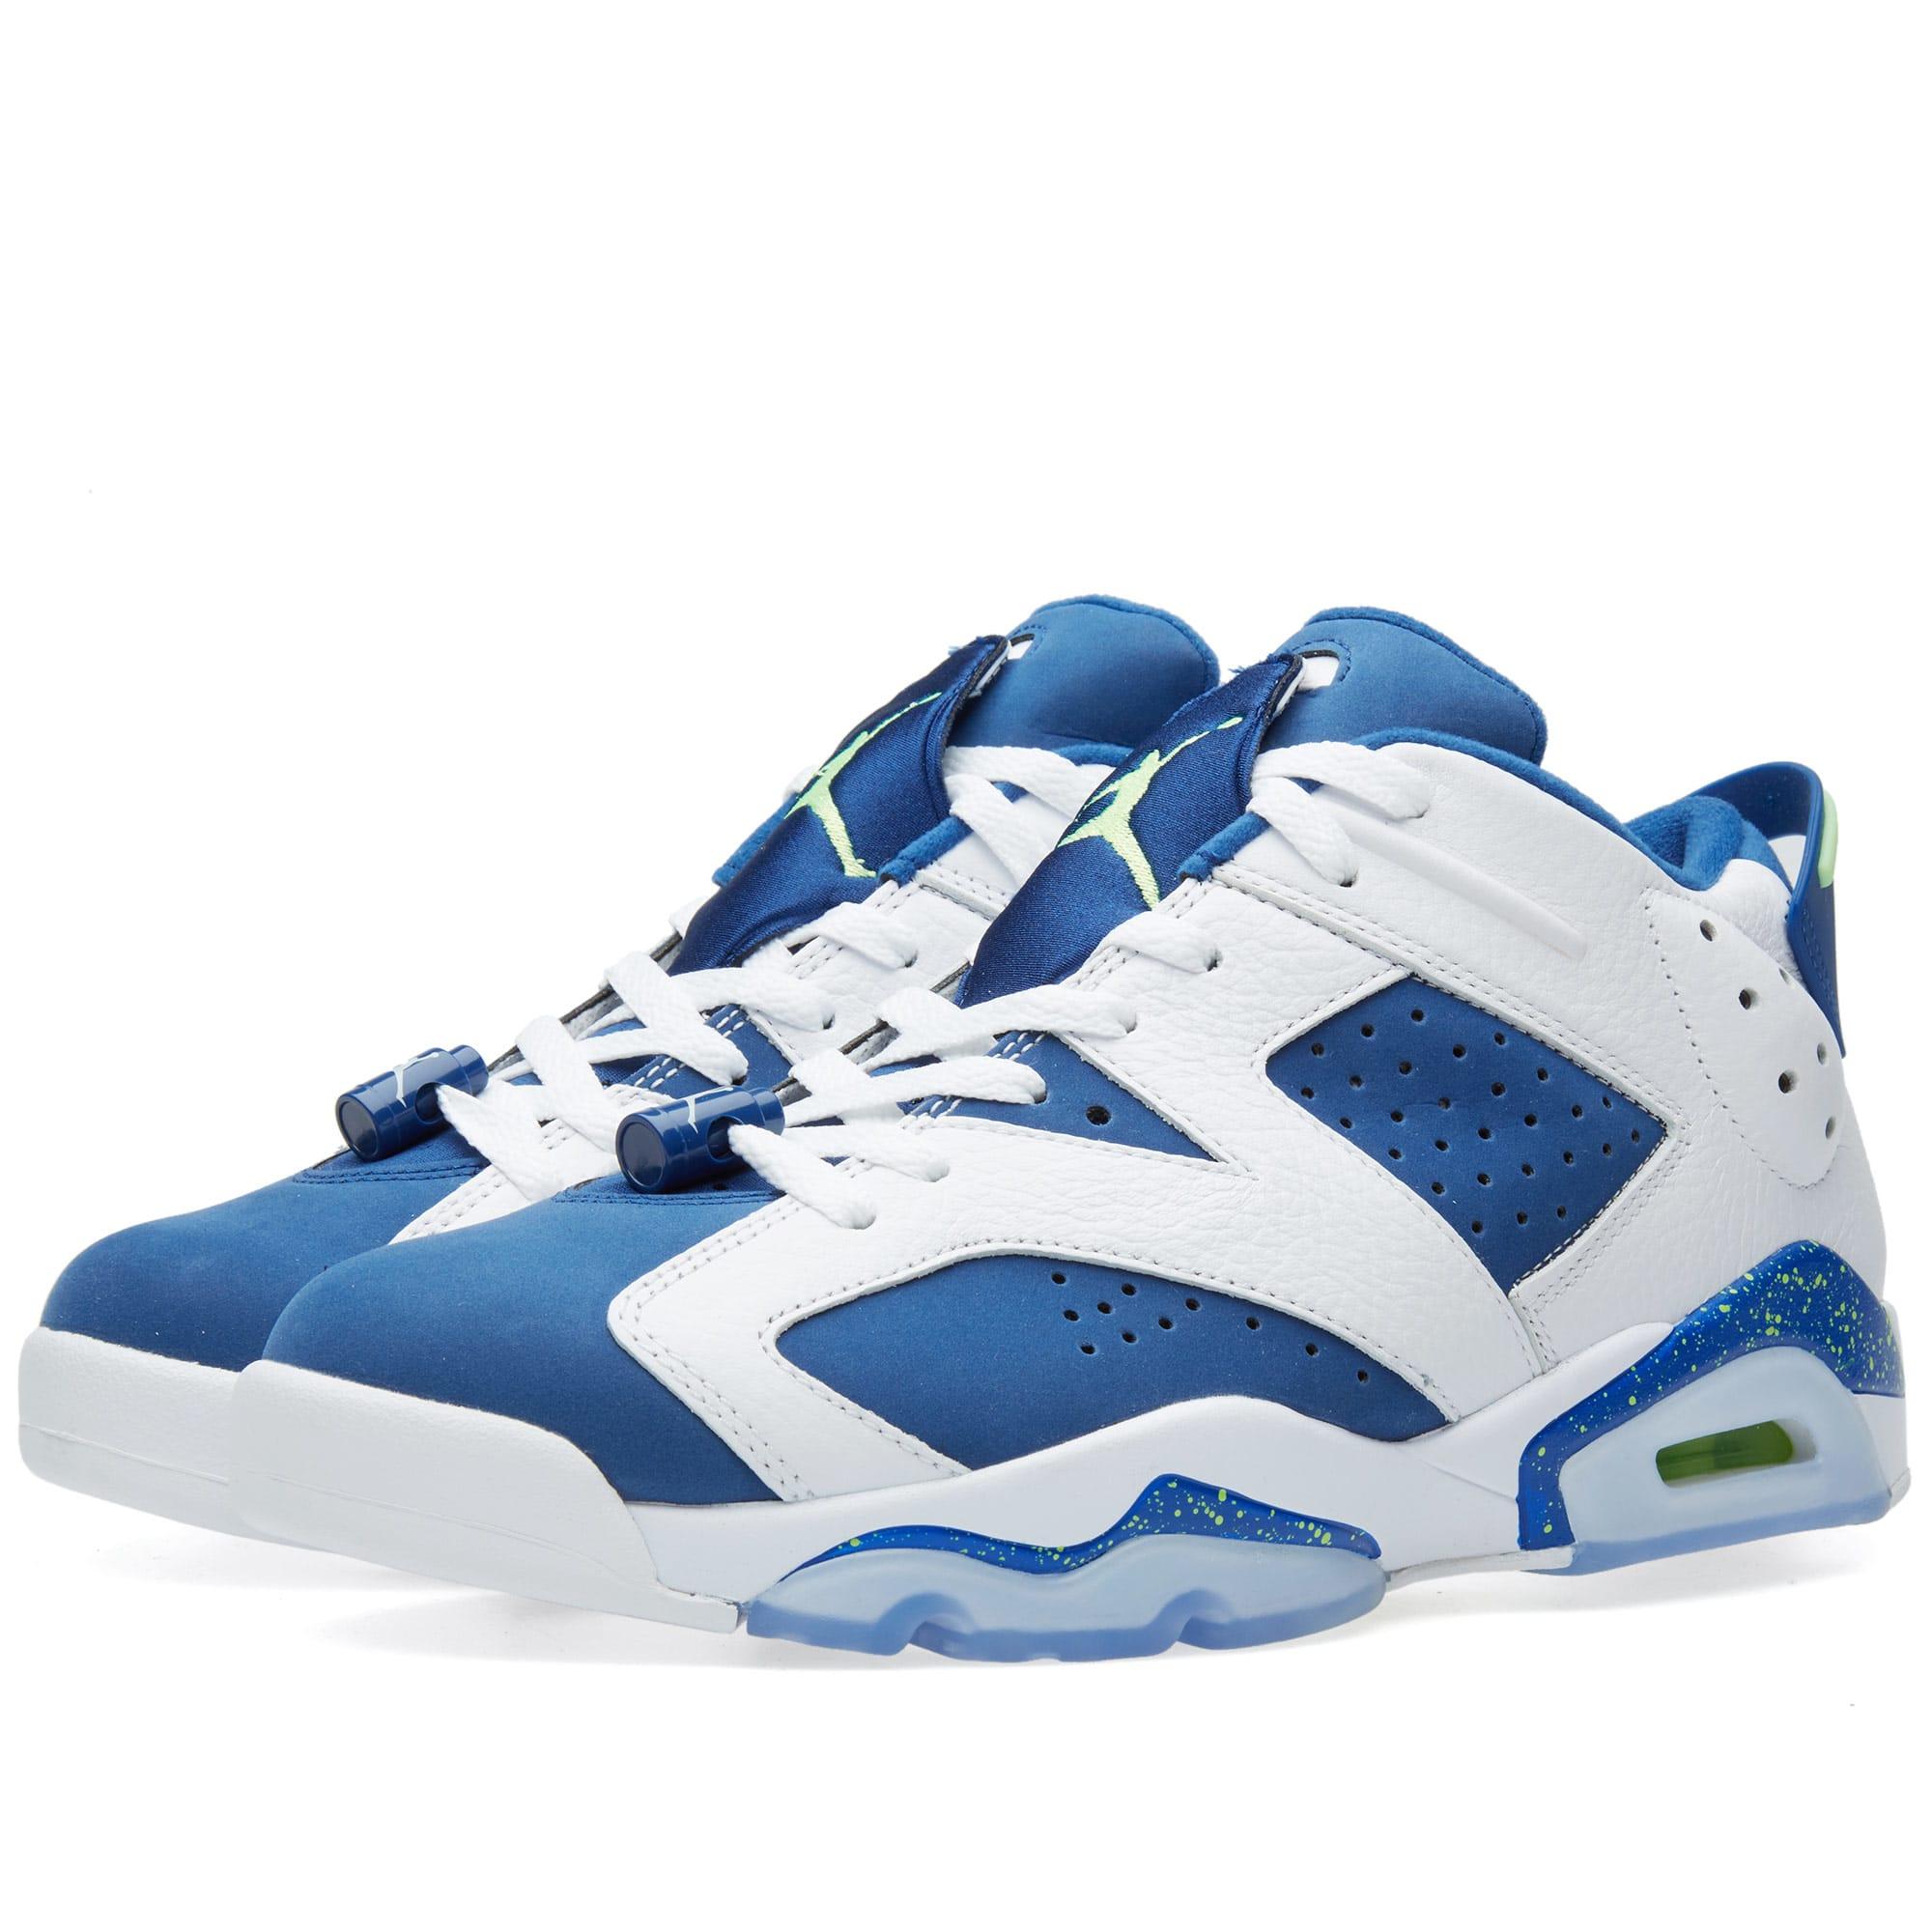 sale retailer c8844 b5a66 Nike Air Jordan VI Retro Low  Insignia Blue  White   Insignia Blue   END.